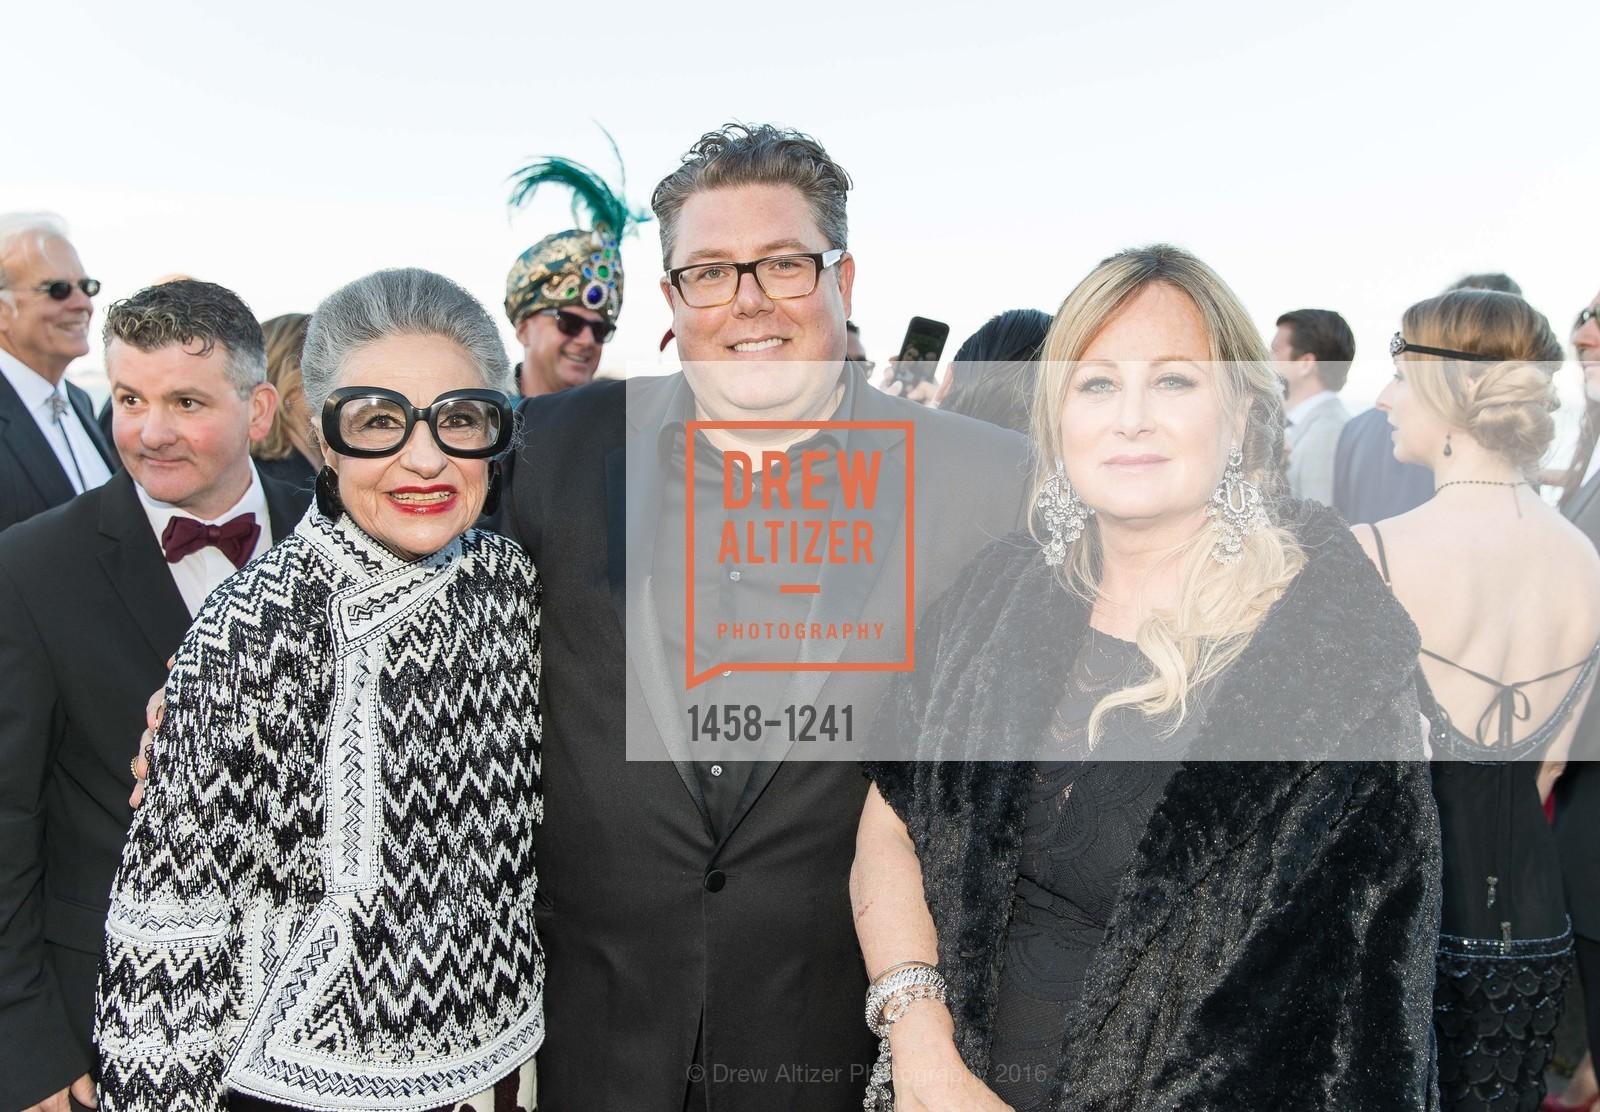 Joy Venturini Bianchi, Clif Loftin, Kelly Stone, Photo #1458-1241